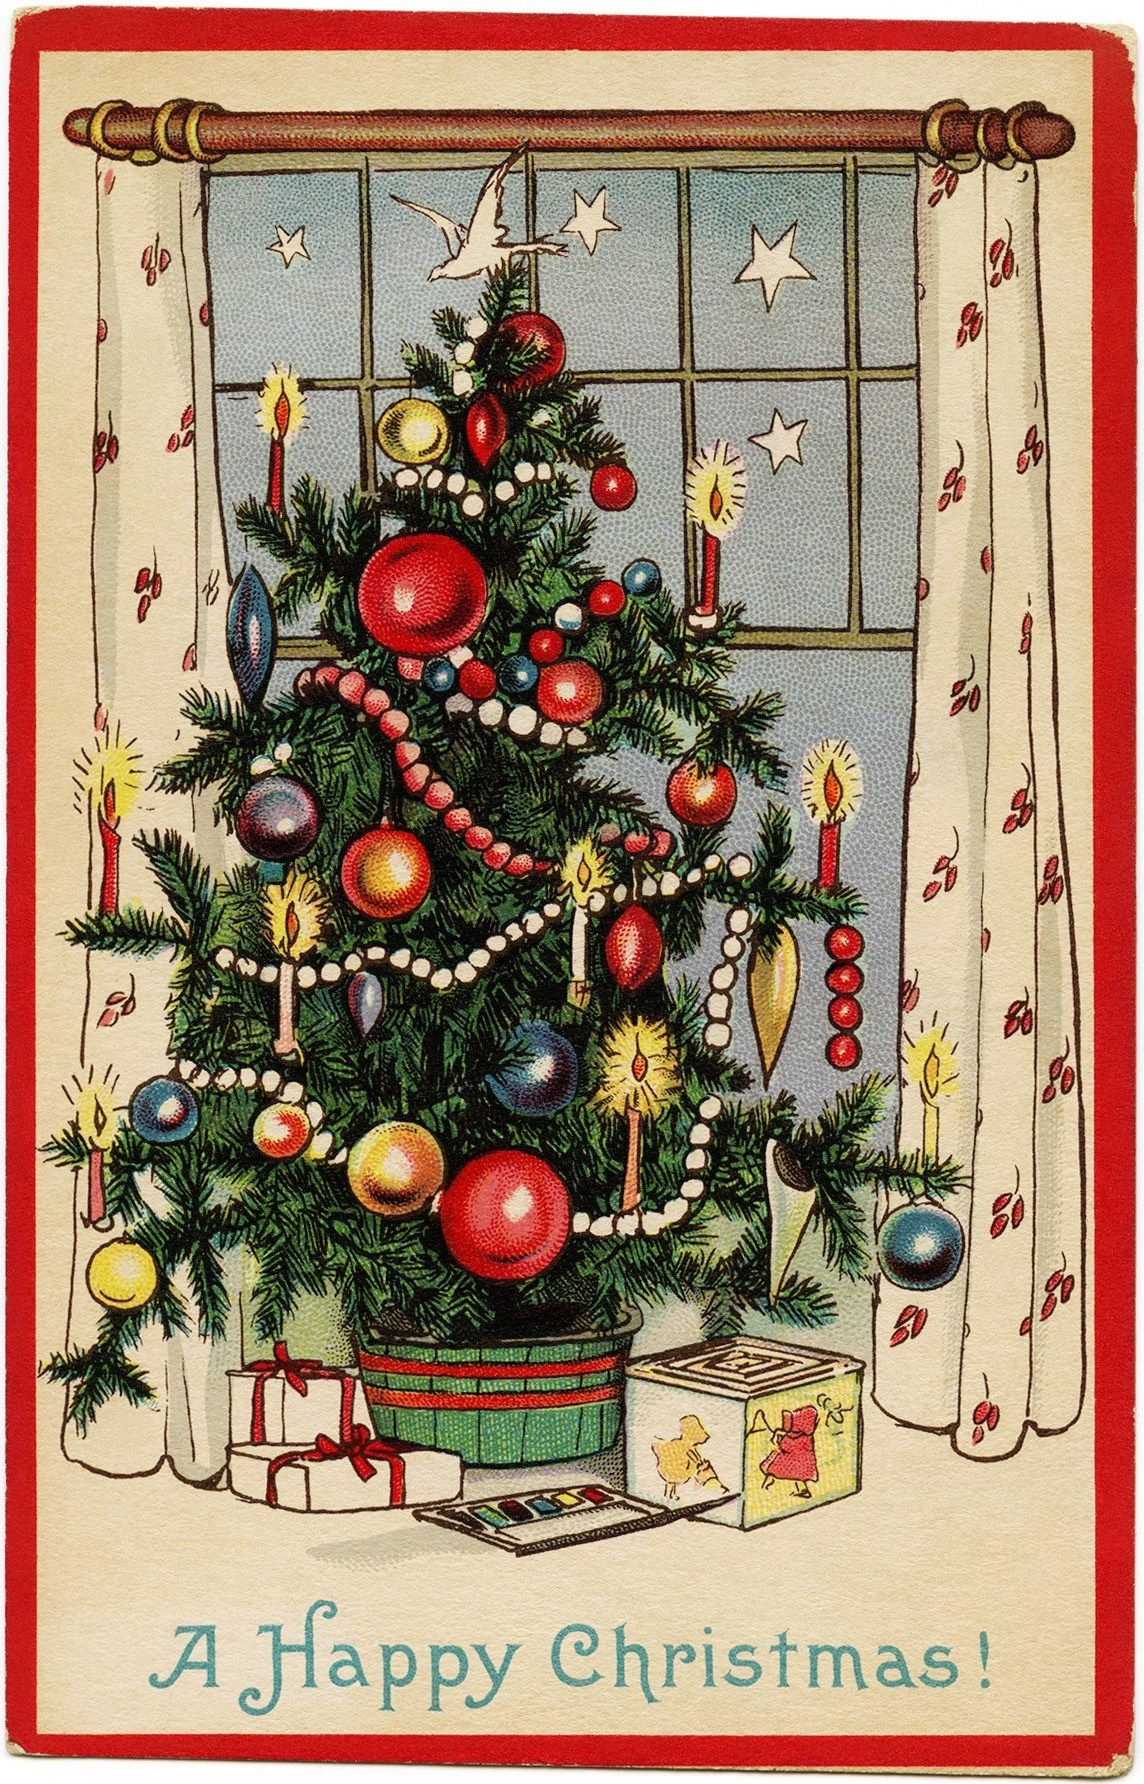 Free Freebie Printable Vintage Christmas Postcard, Christmas Tree - Free Printable Vintage Christmas Images